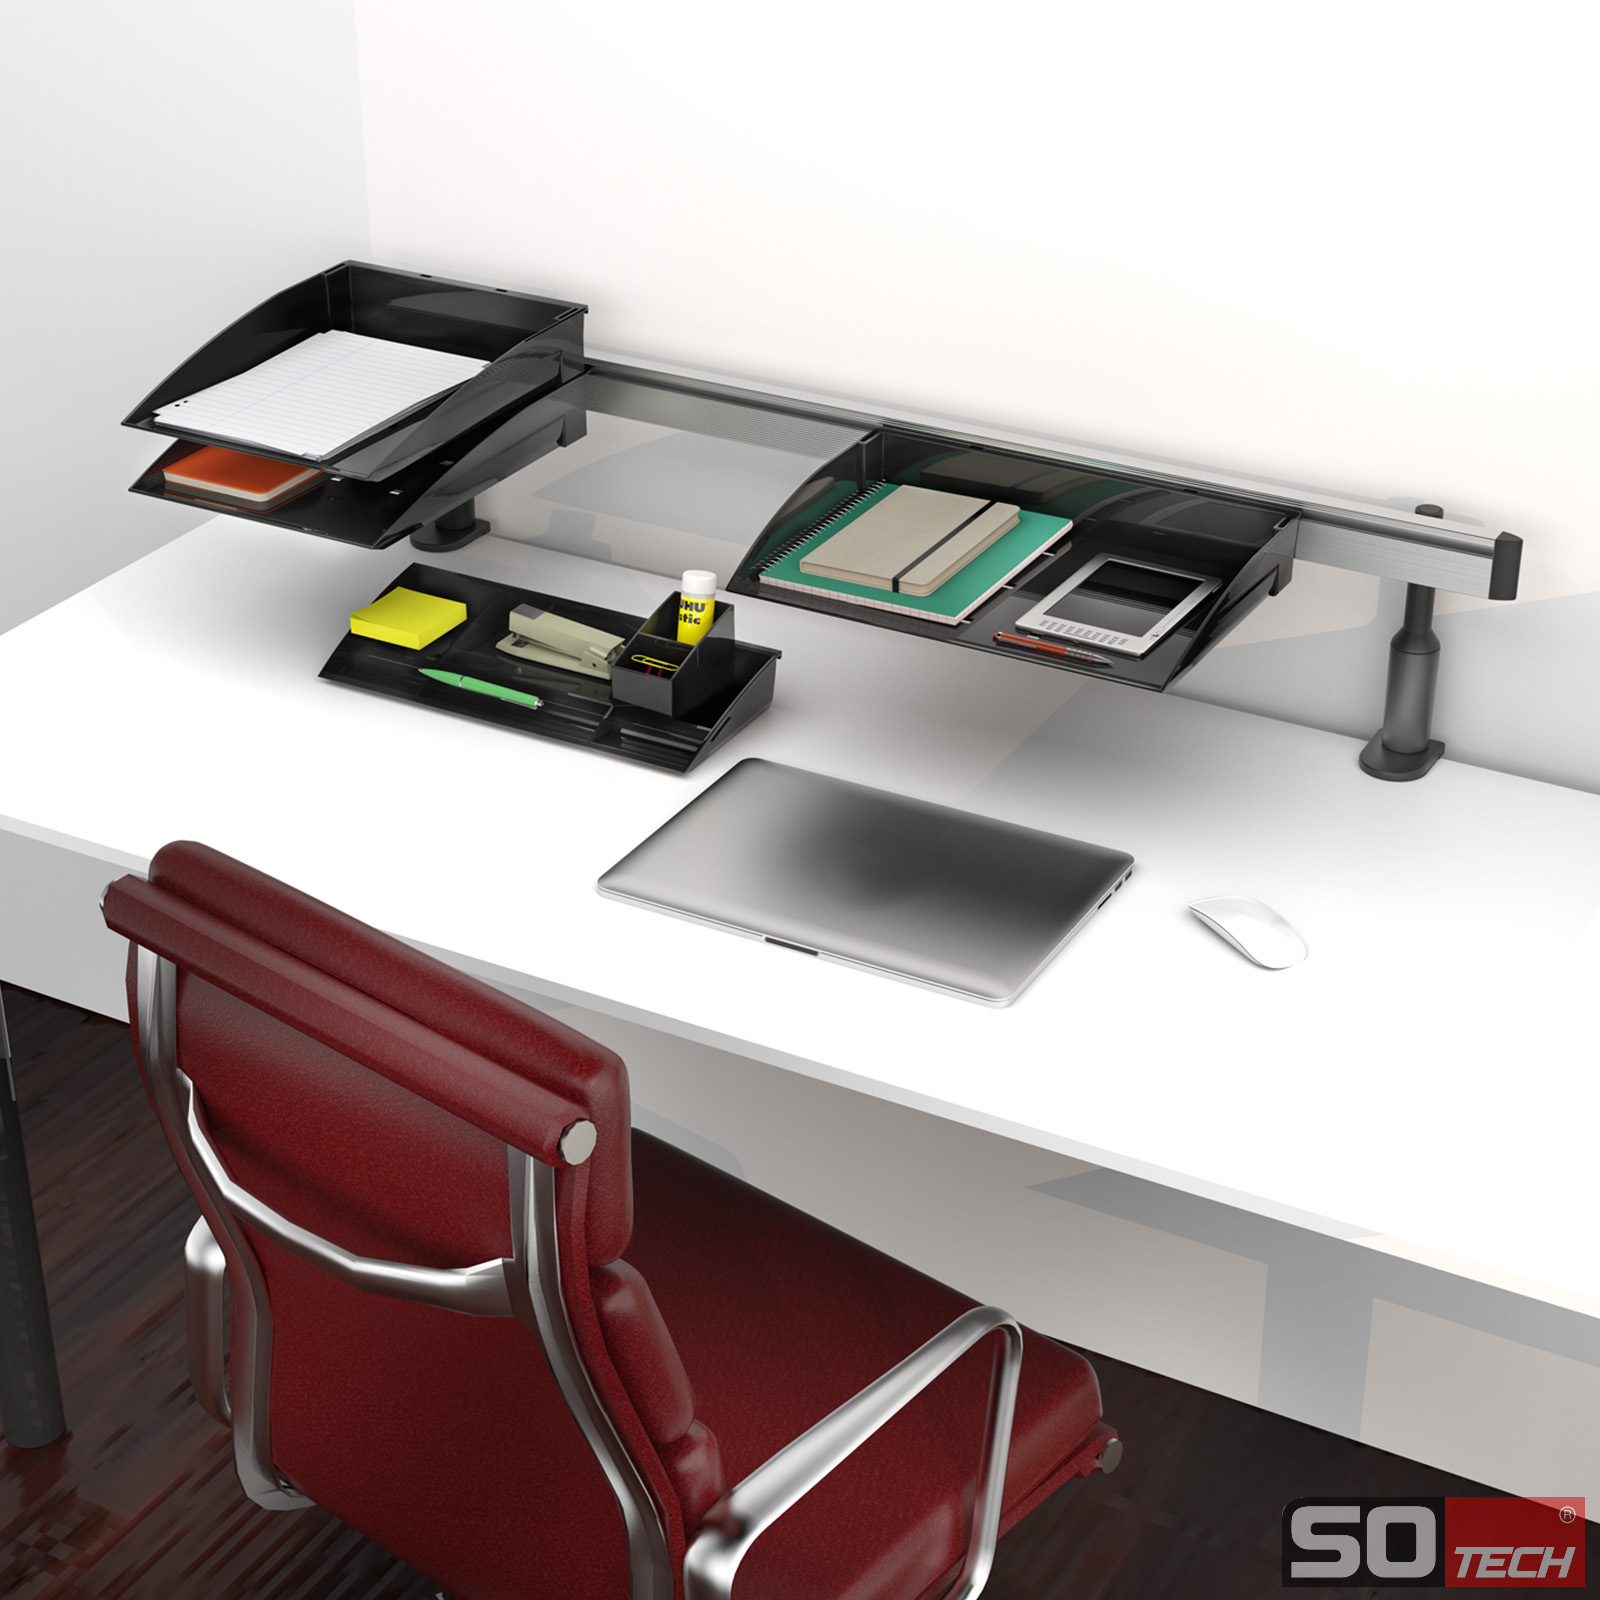 Sotech So Tech Ninka Office Utensilien Ablageschale Ablagefach